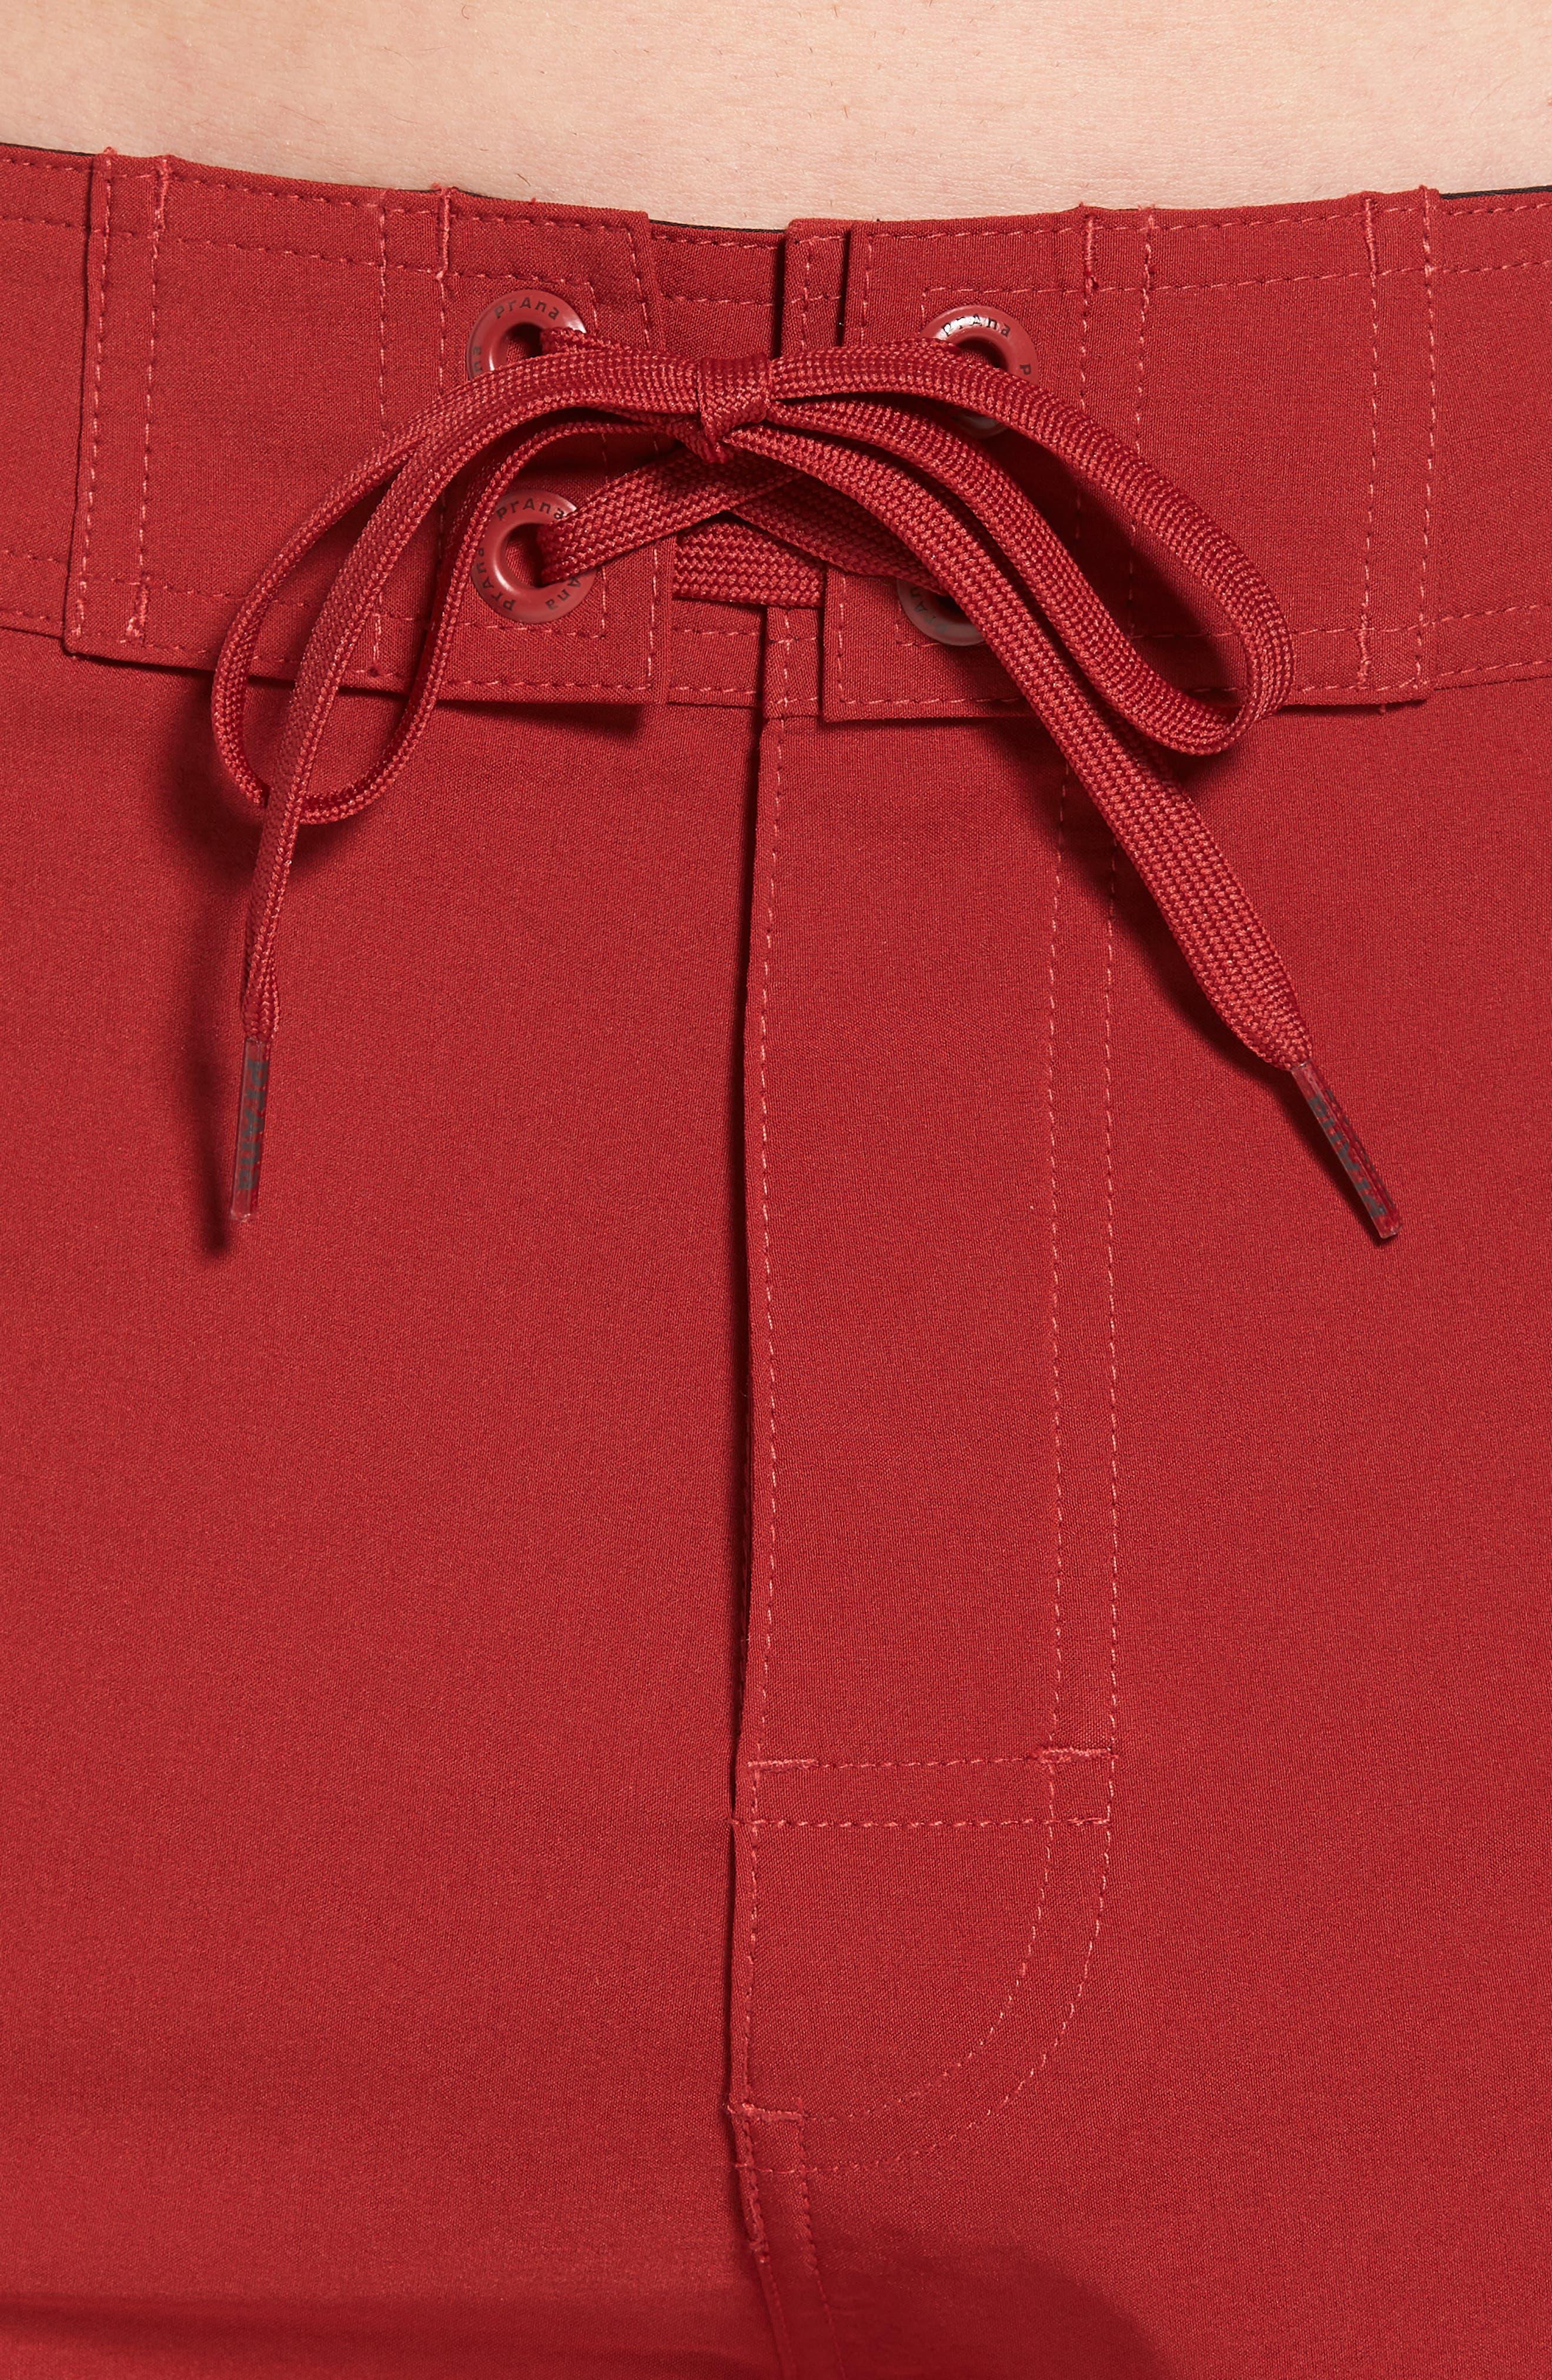 'Sediment' Stretch Board Shorts,                             Alternate thumbnail 56, color,